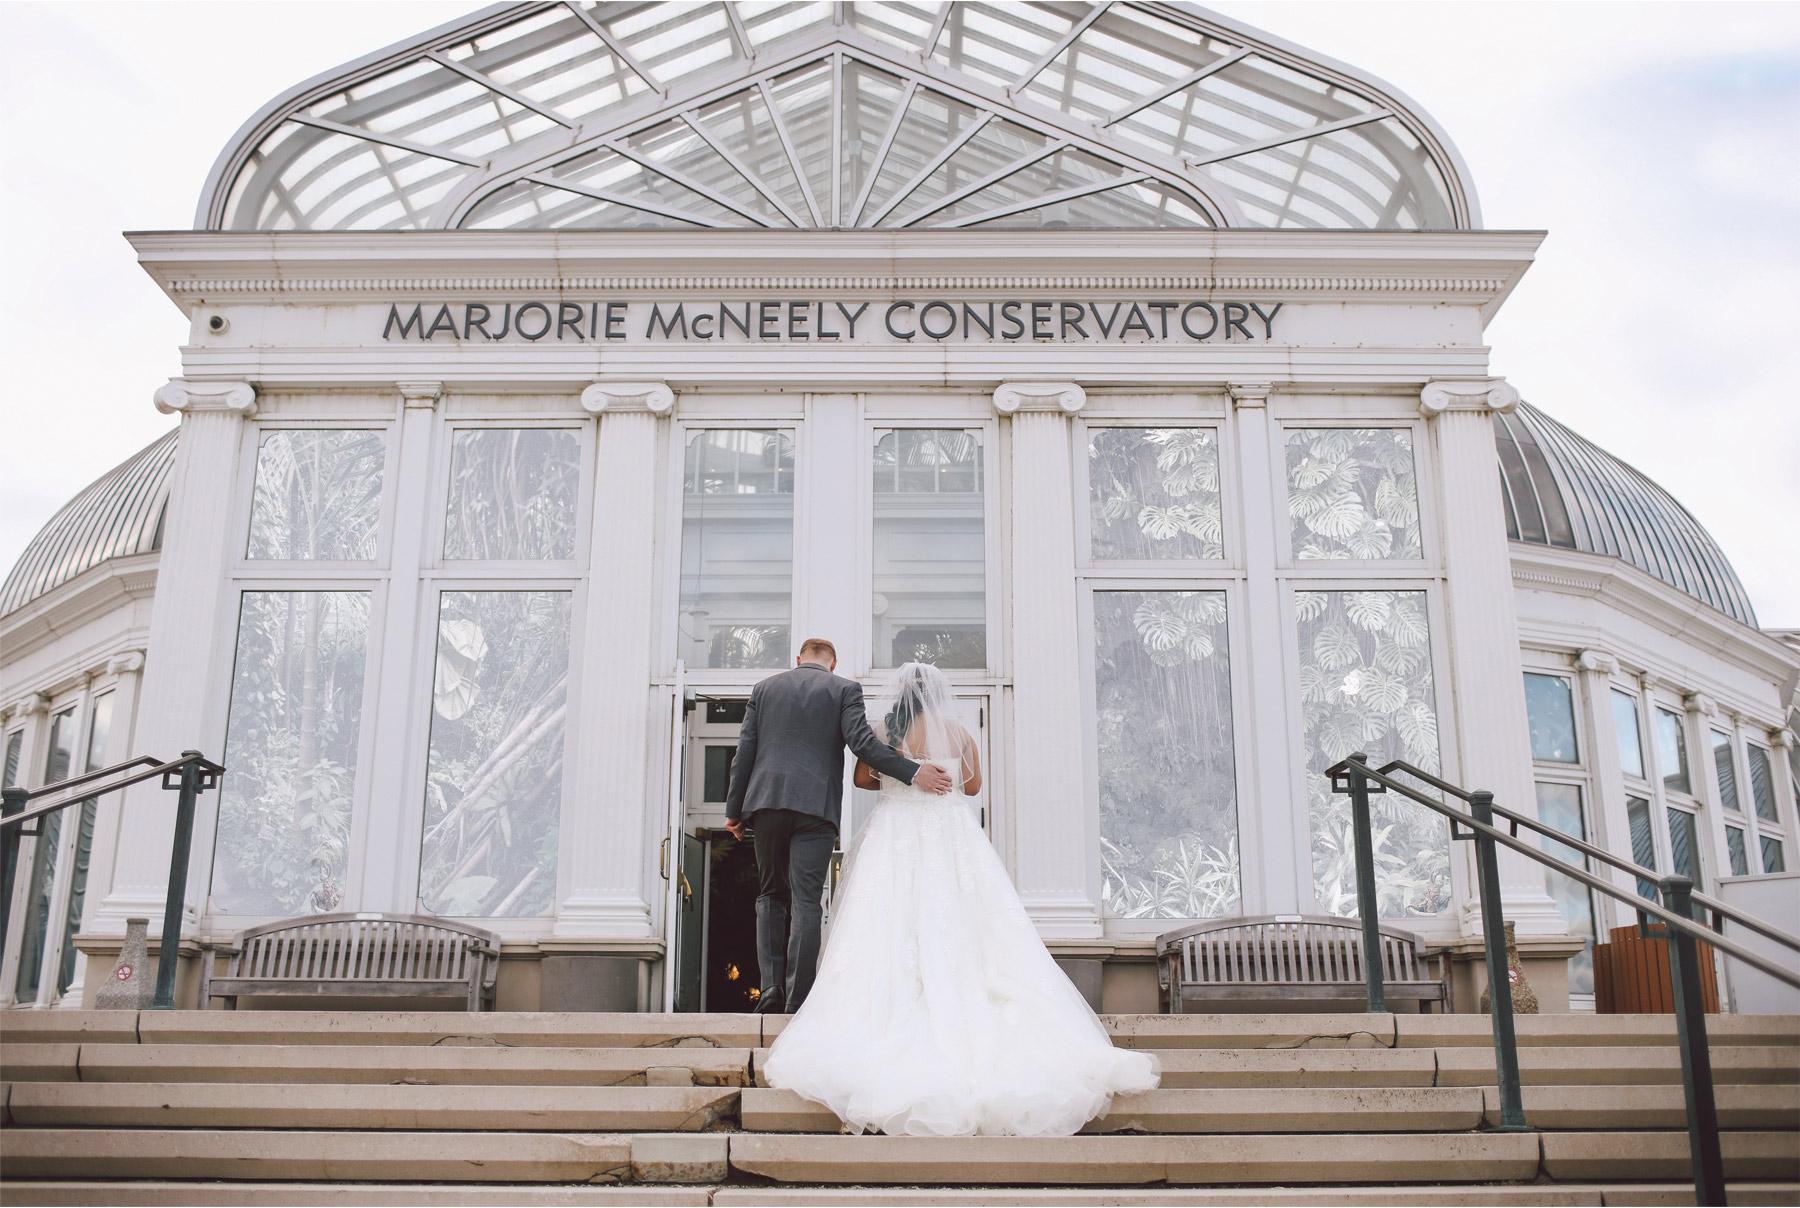 10-Saint-Paul-Minnesota-Wedding-Photography-by-Vick-Photography-Como-Park-Conservatory-Bride-Groom-Elena-and-Doug.jpg